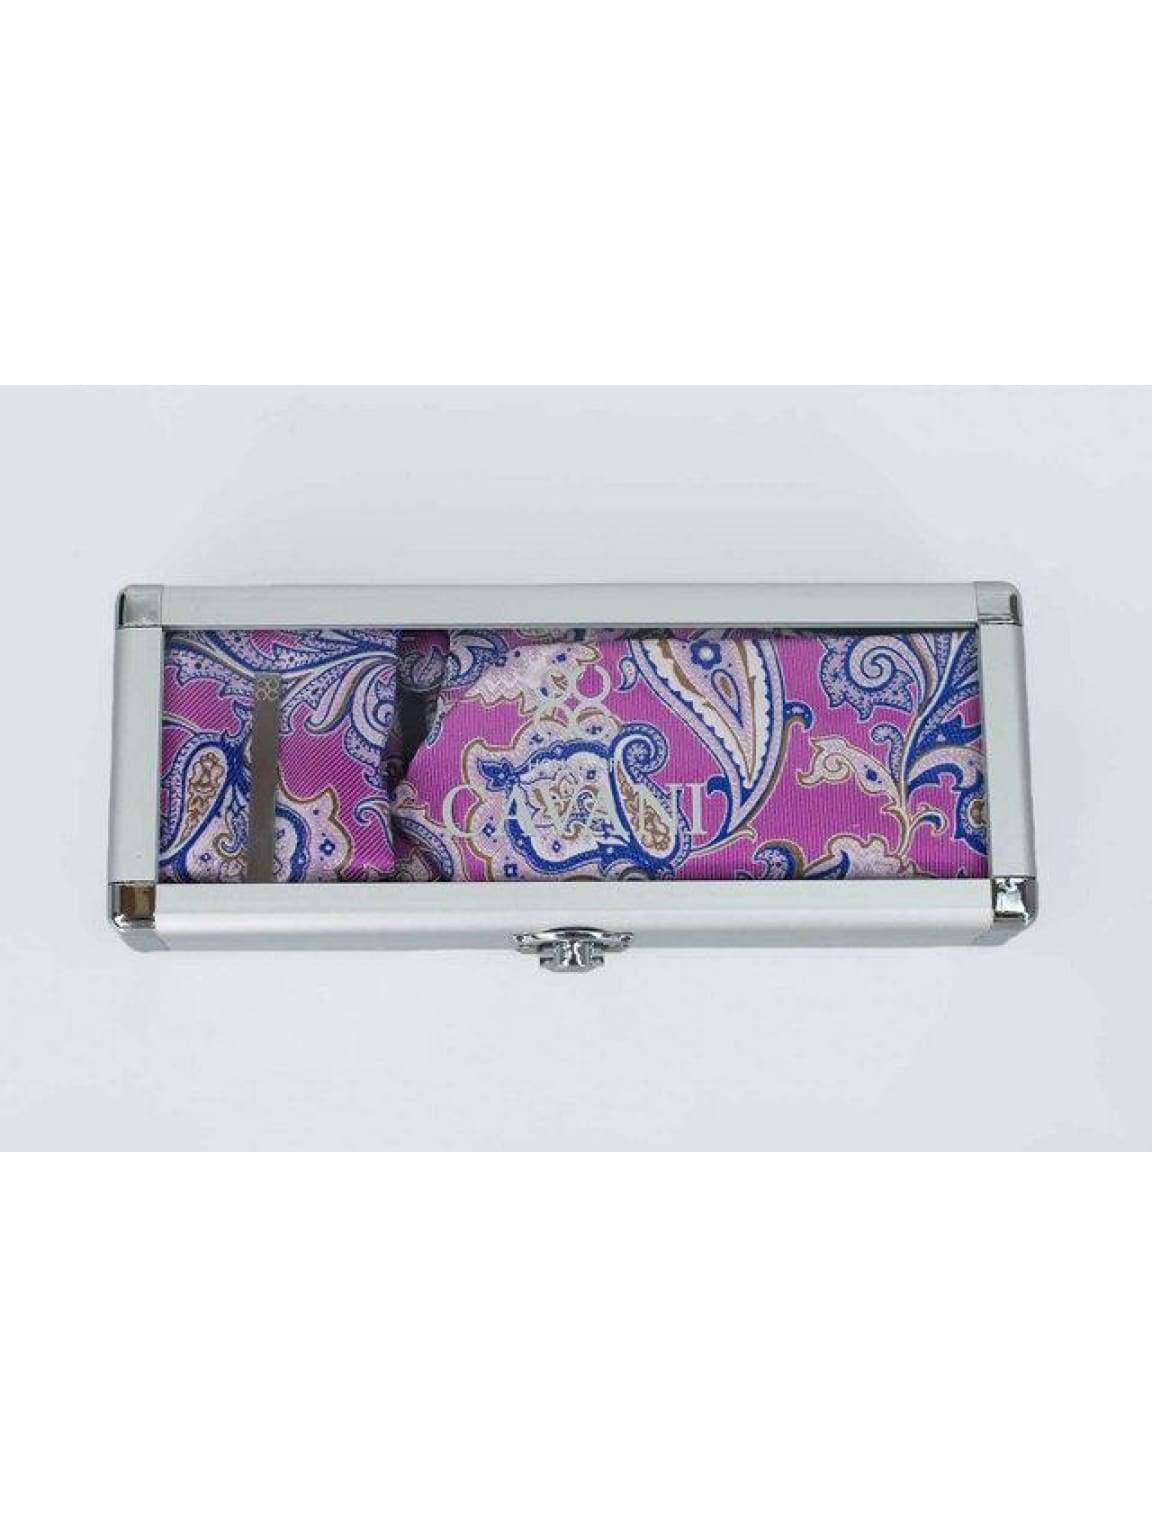 Cavani Pink Paisley Tie Hank Tie Pin Cufflinks Set - Accessories